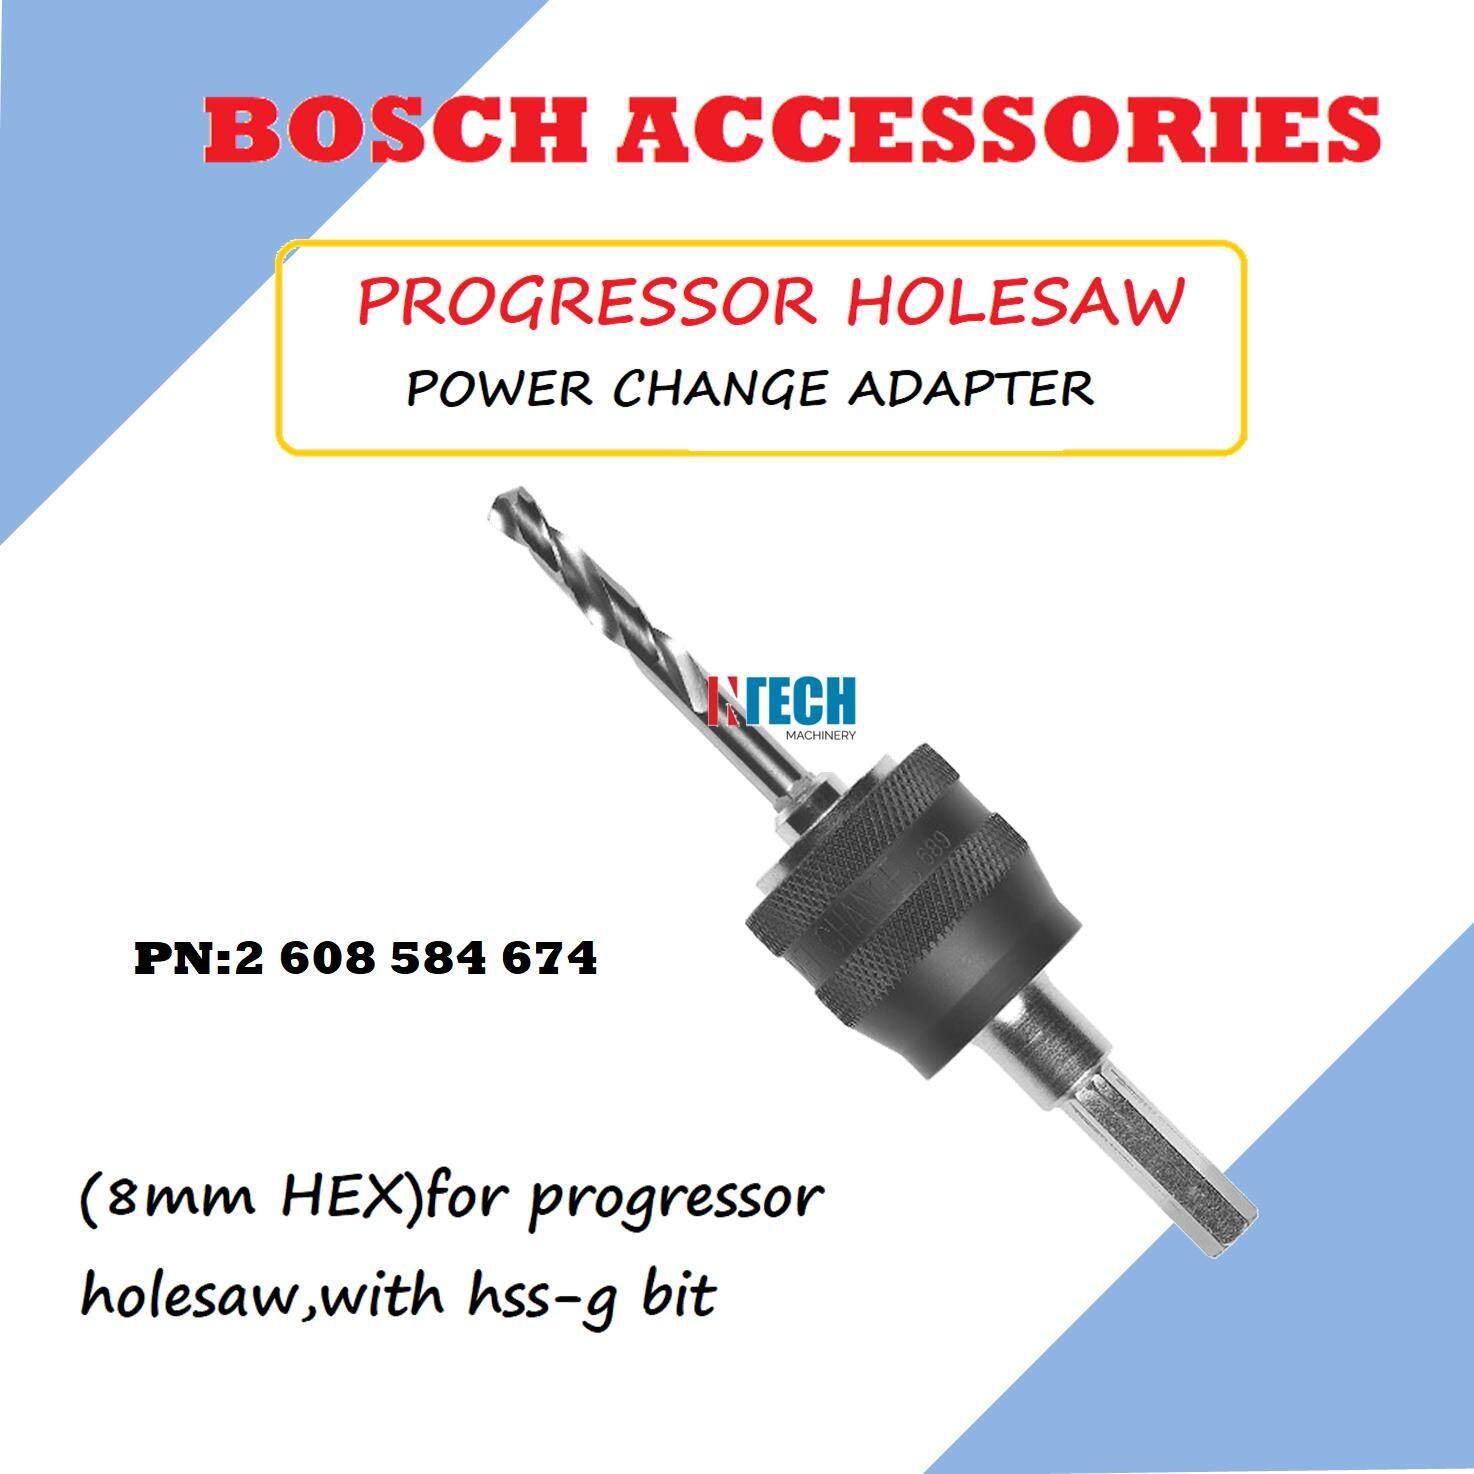 BOSCH PROGRESSOR HOLESAW POWER CHANGE ADAPTER (8mm HEX) PN:2608584674